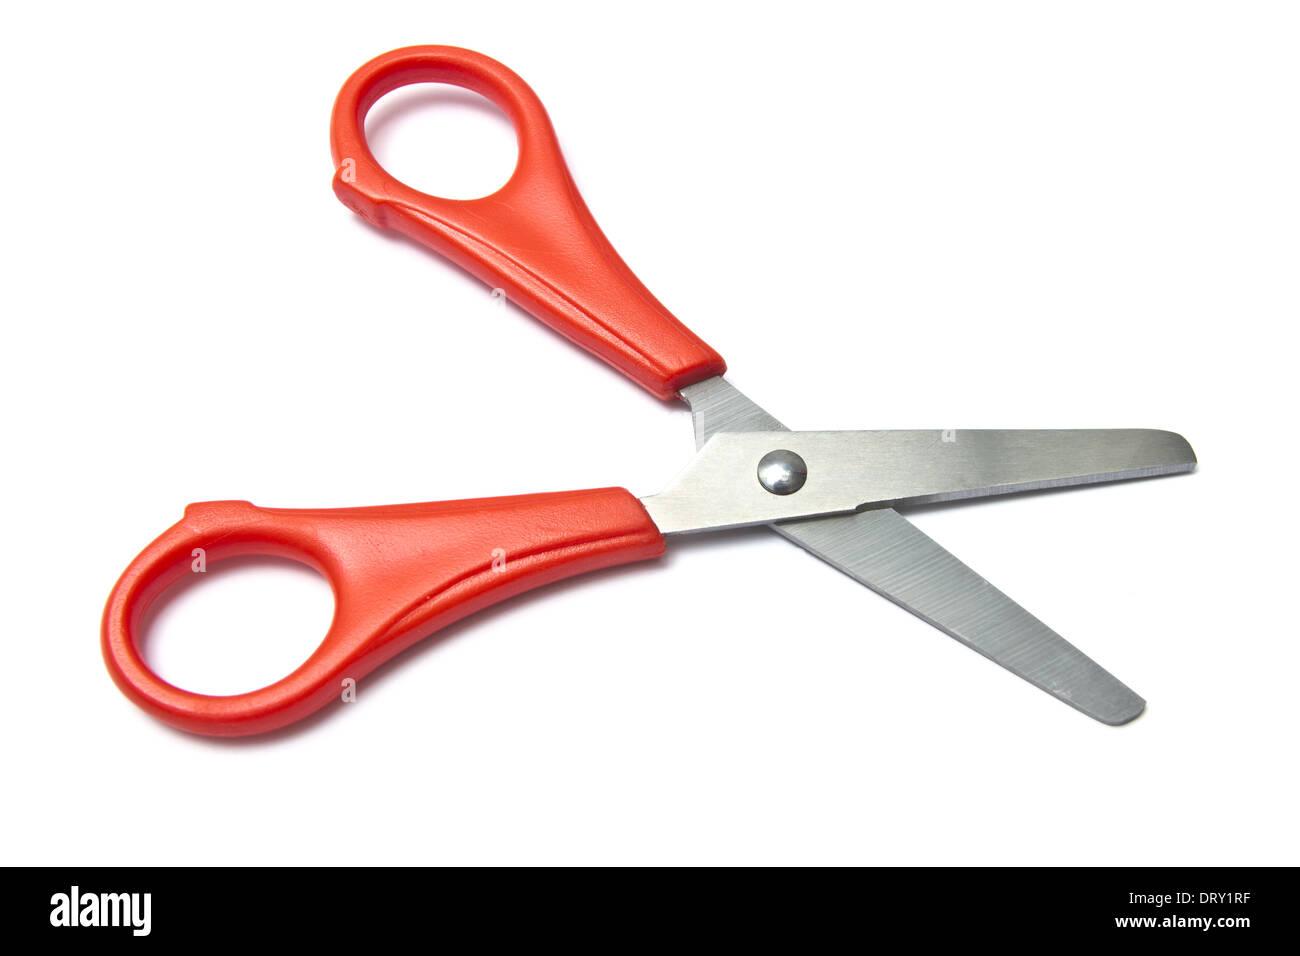 Red handled scissors - Stock Image